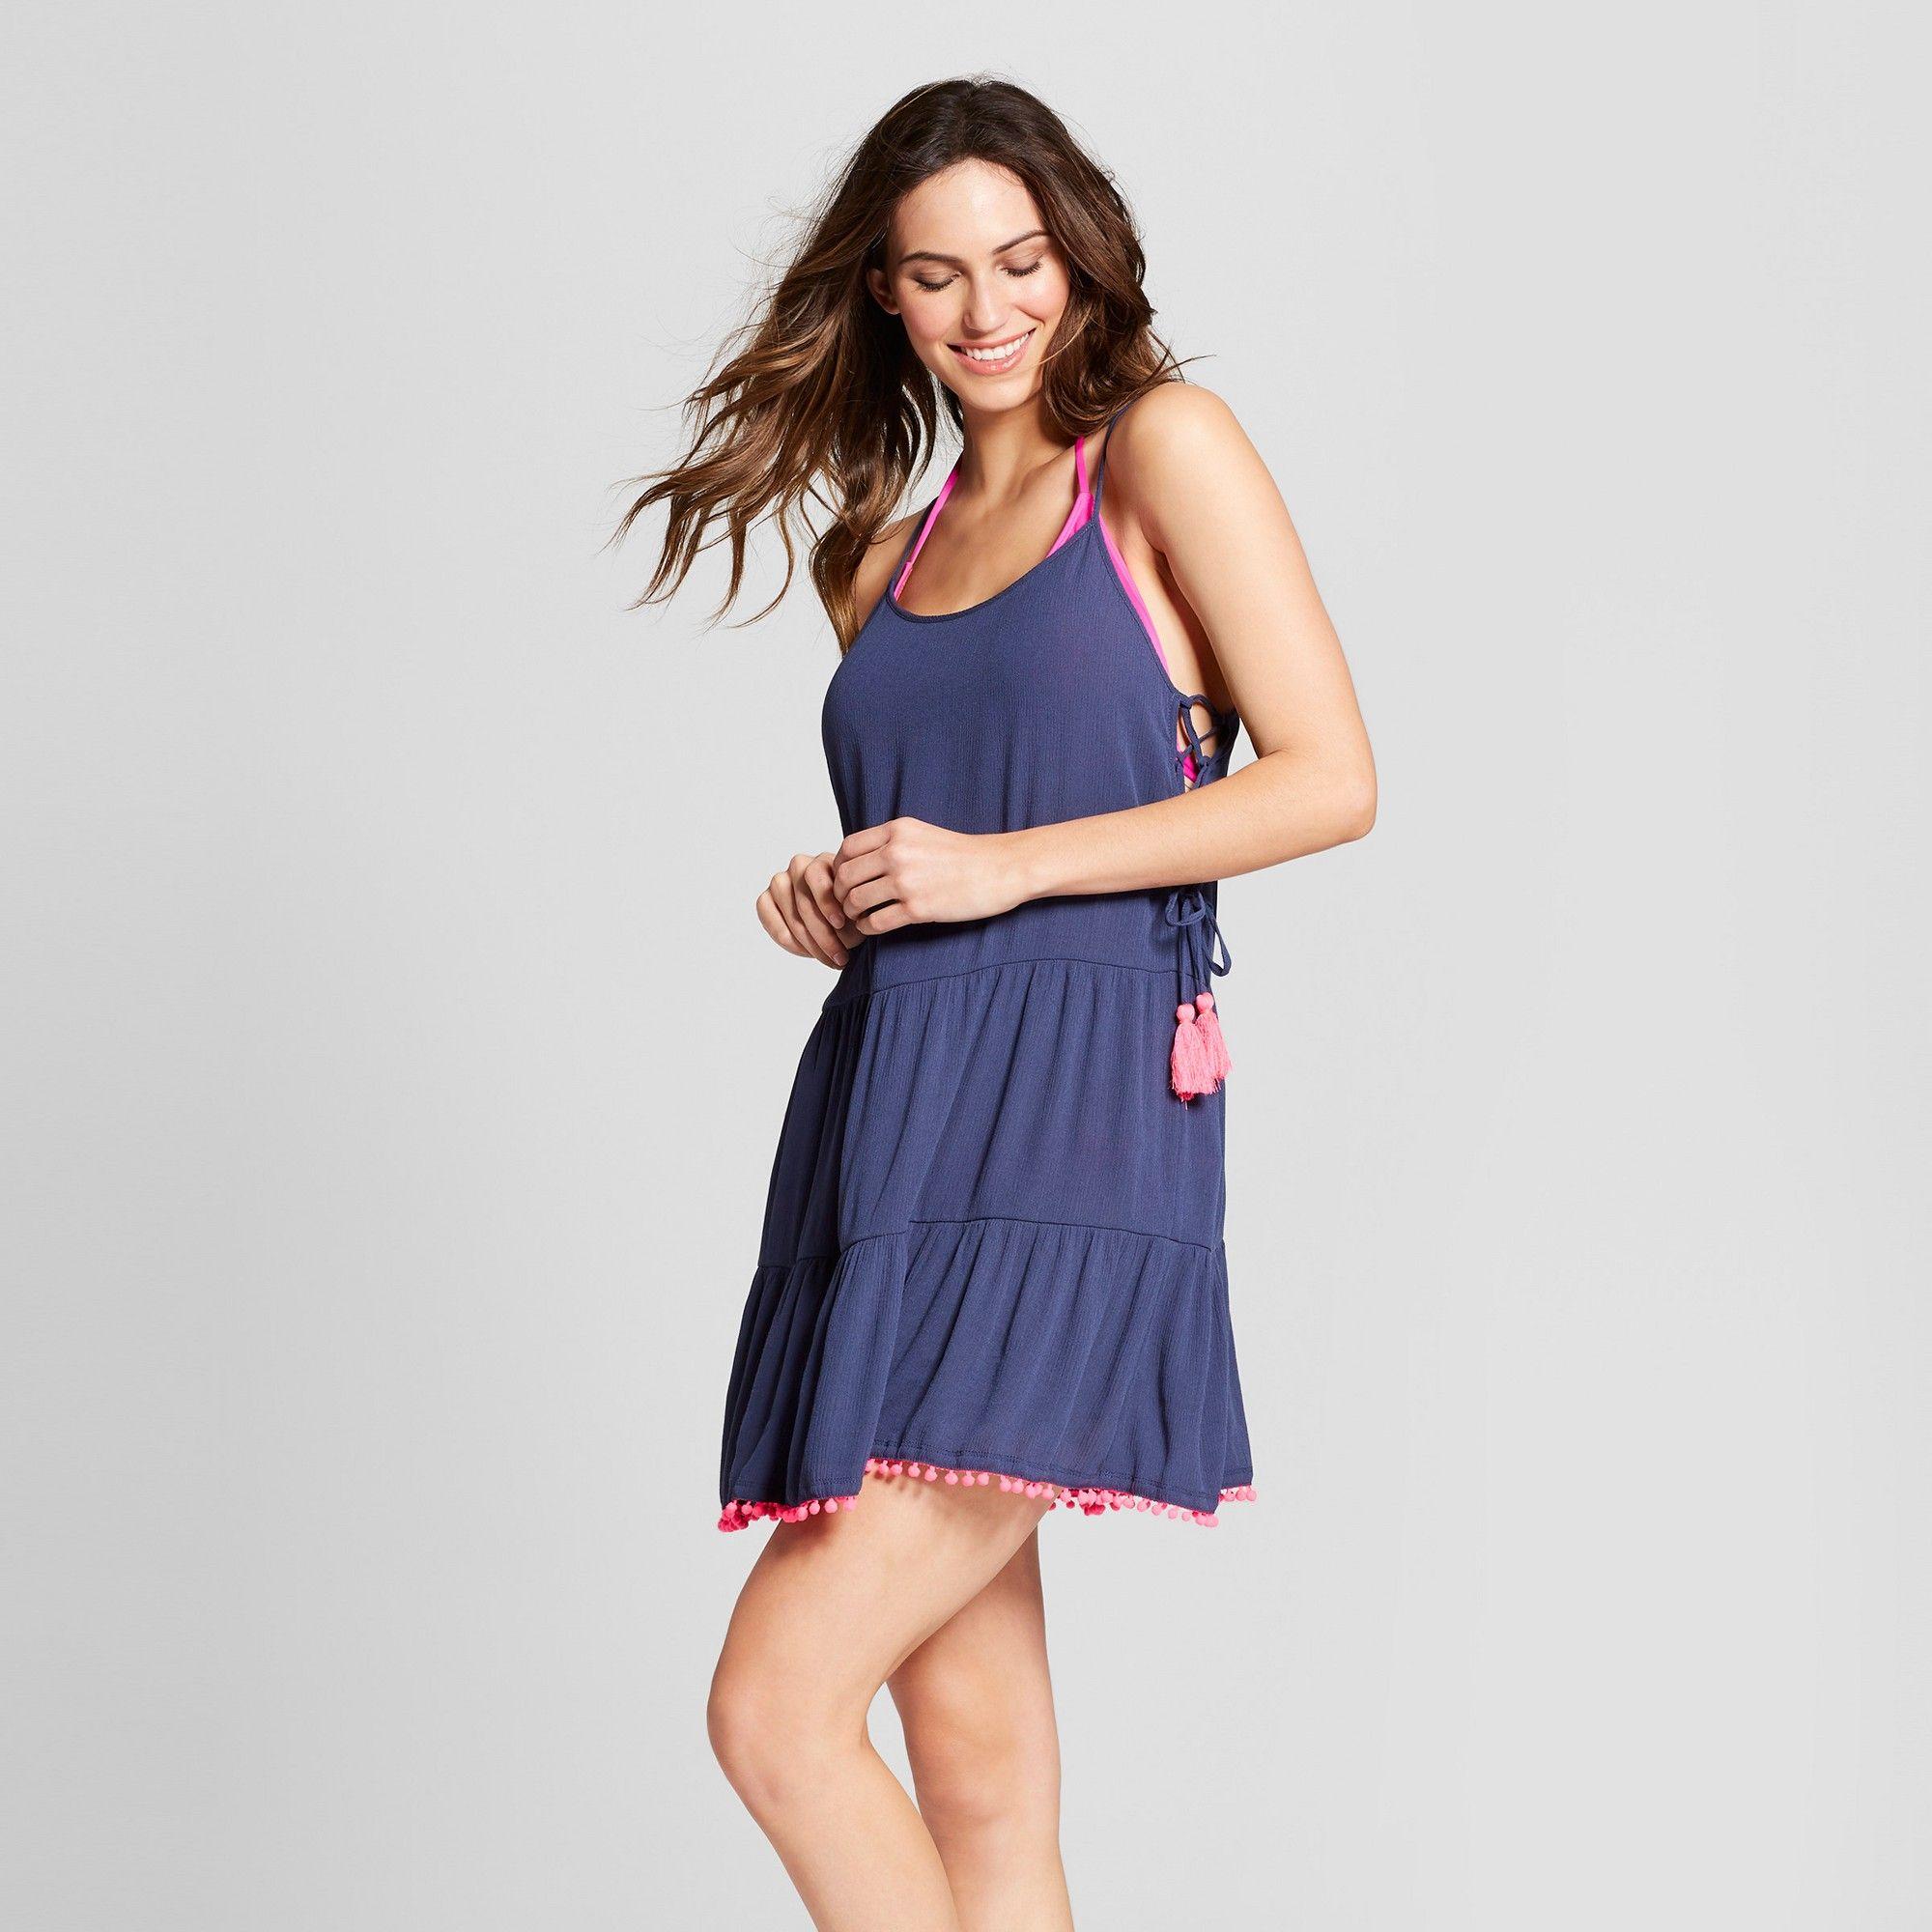 efda39b4a8592 Women s Lace Up Cover Up Dress - Xhilaration Blue M